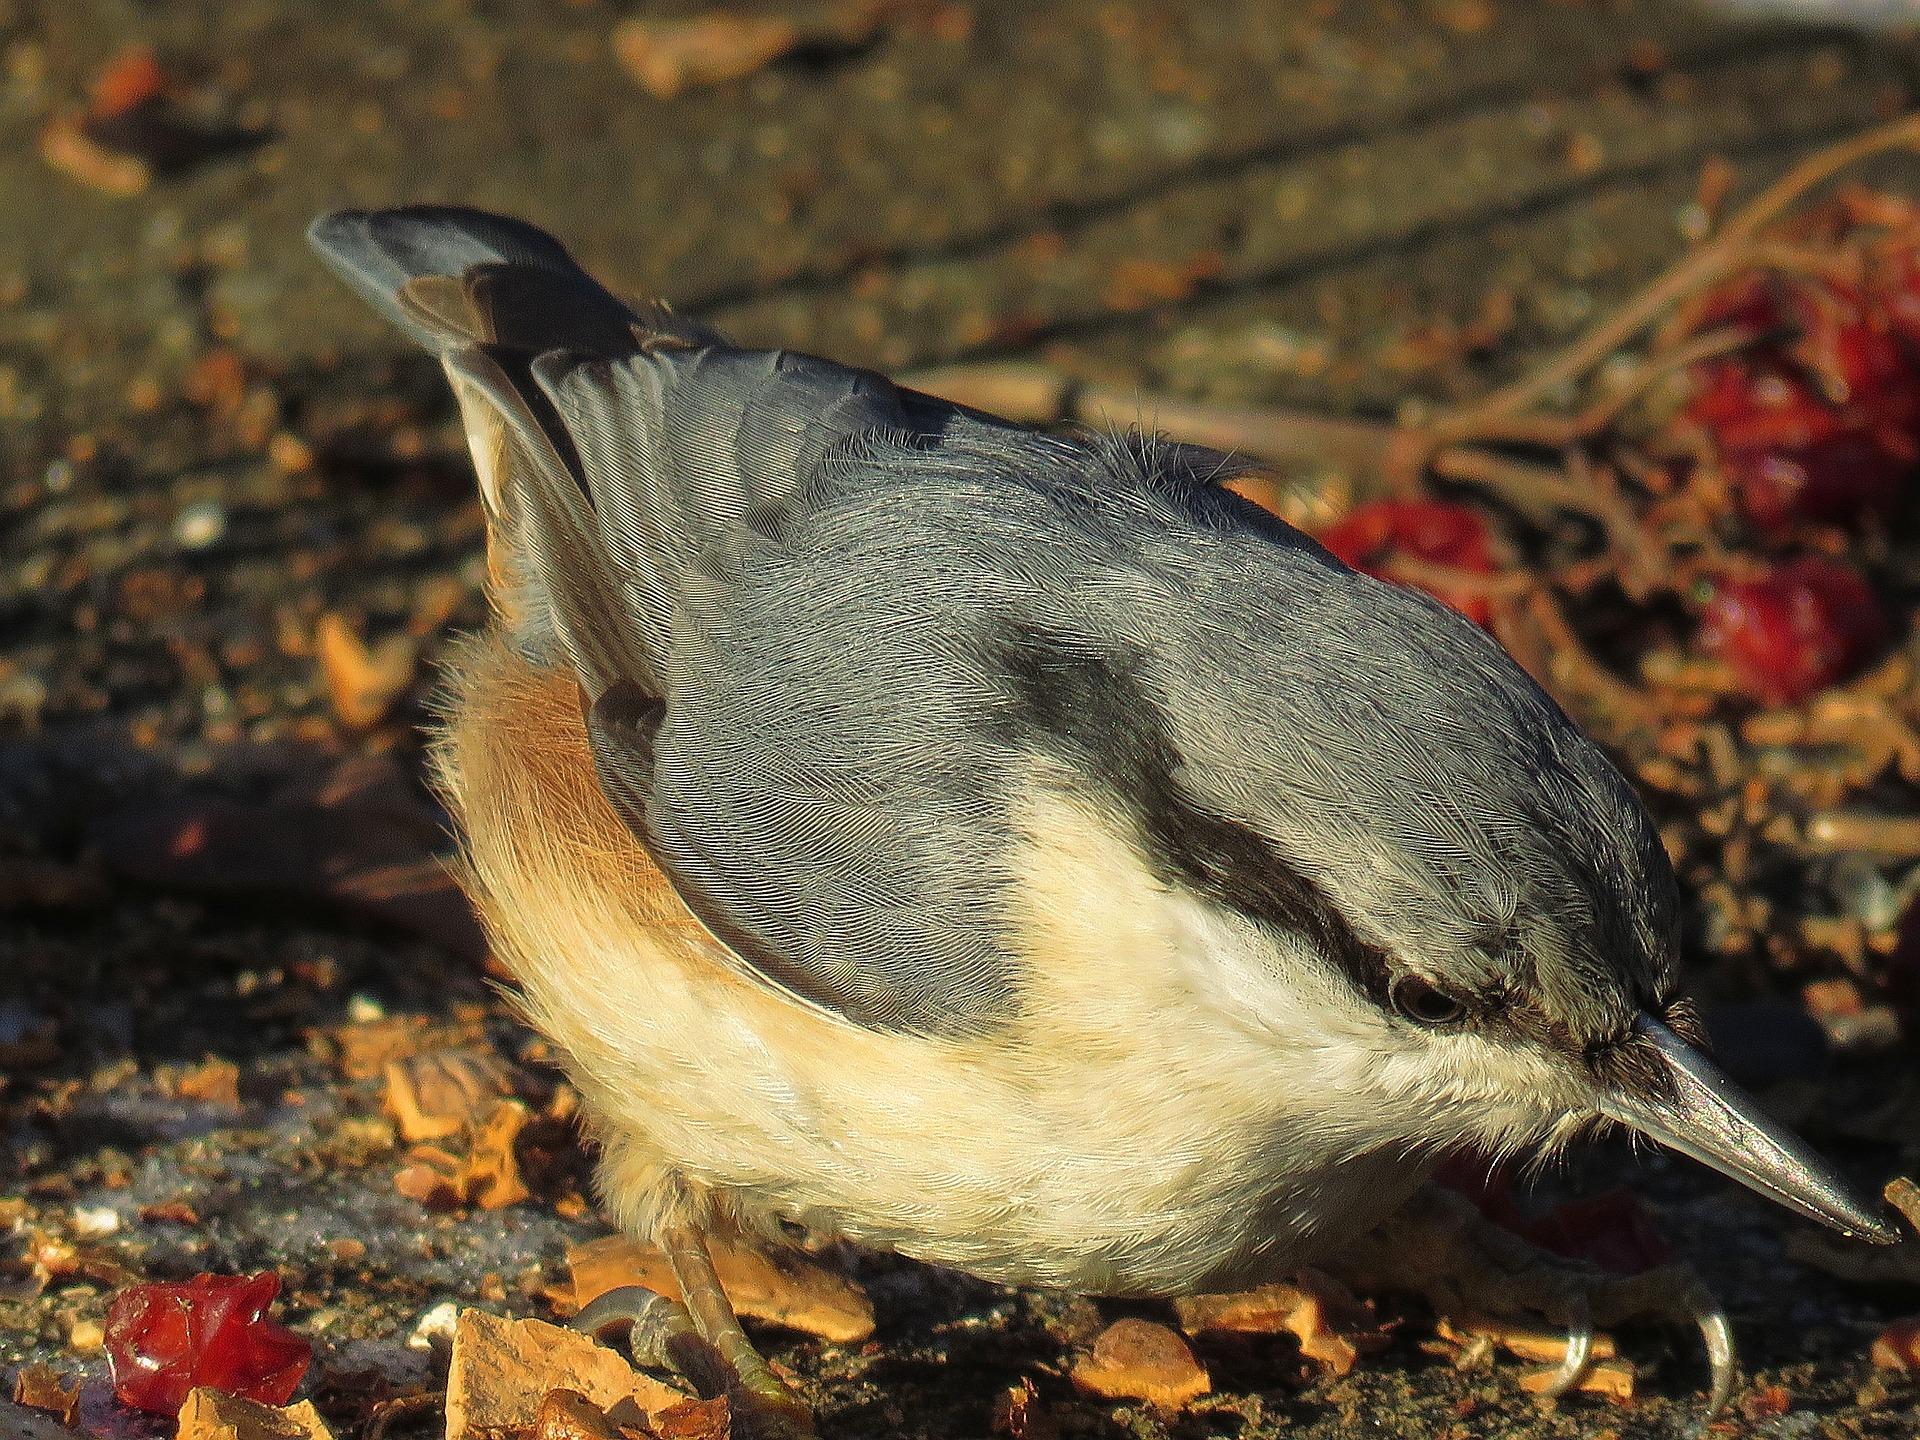 bird-1949245_1920.jpg